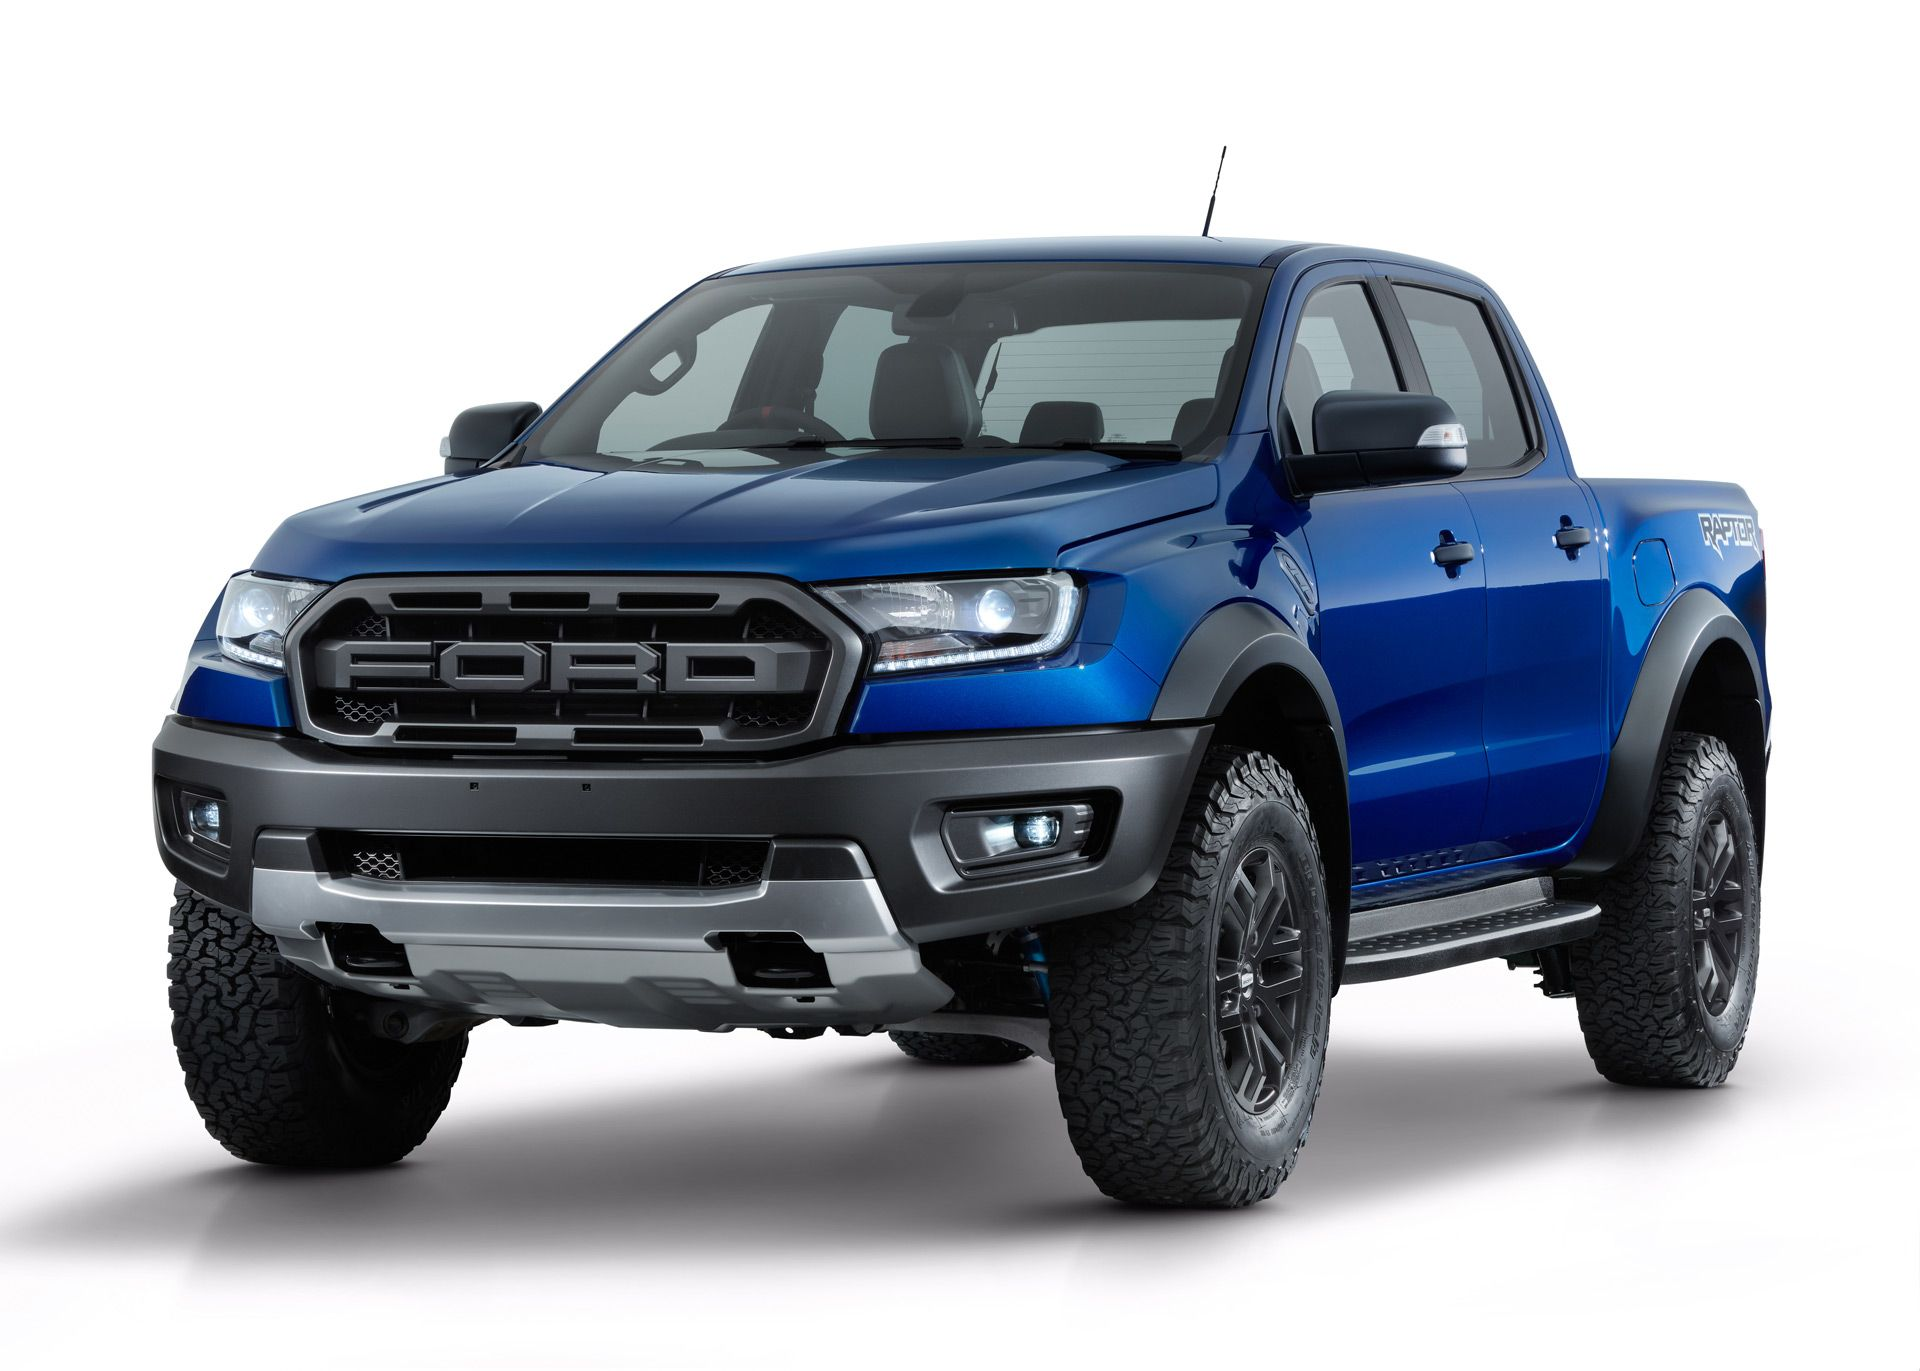 2019 Ford Ranger Raptor Debuts With 210 Horsepower Diesel In 2020 Ford Ranger Raptor Ford Ranger 2019 Ford Ranger